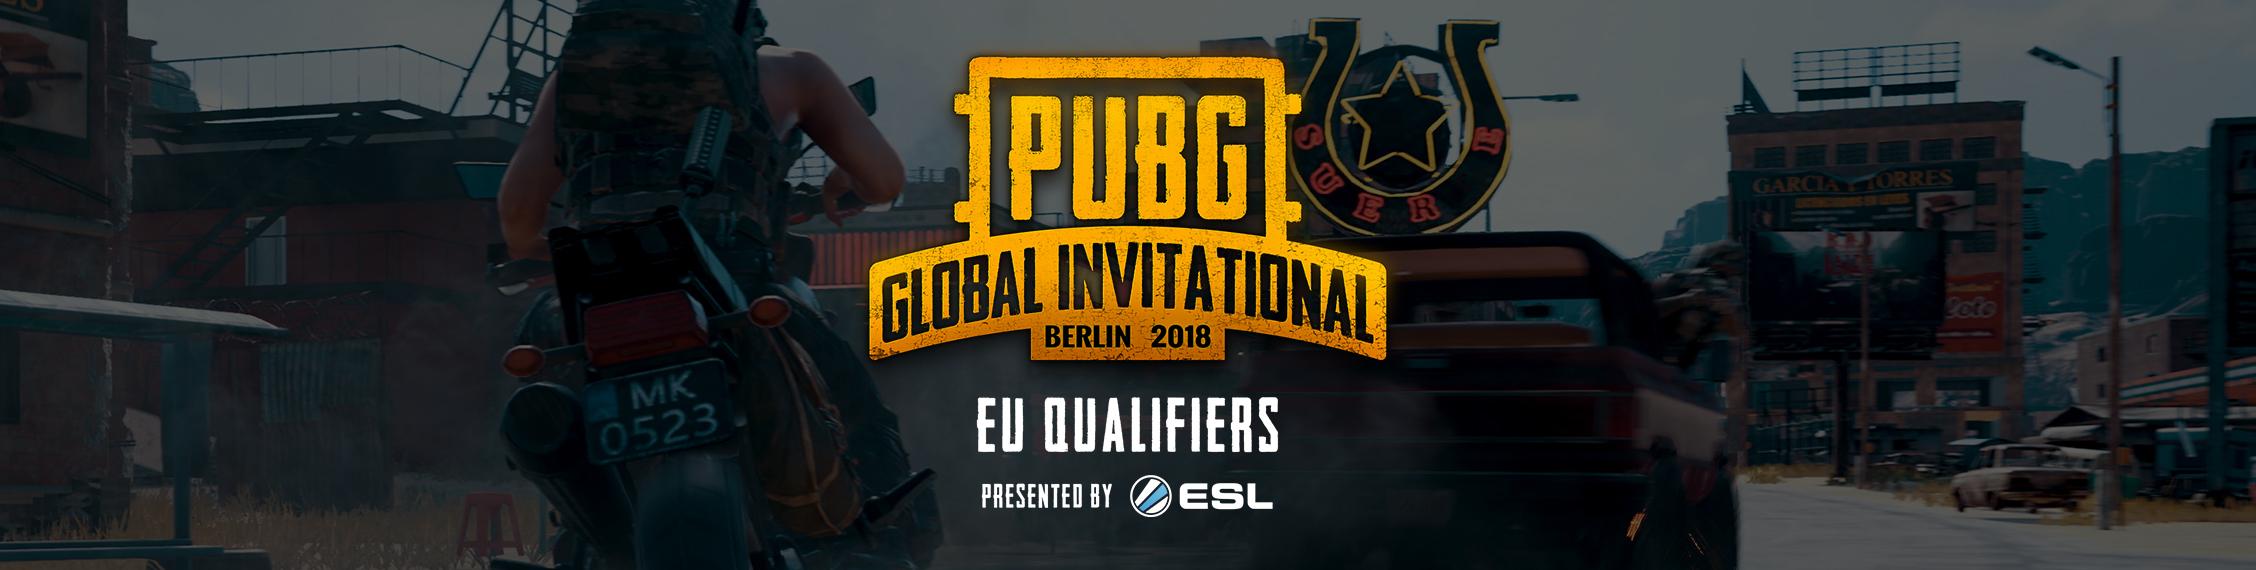 PGI EU Qualifiers presented by ESL